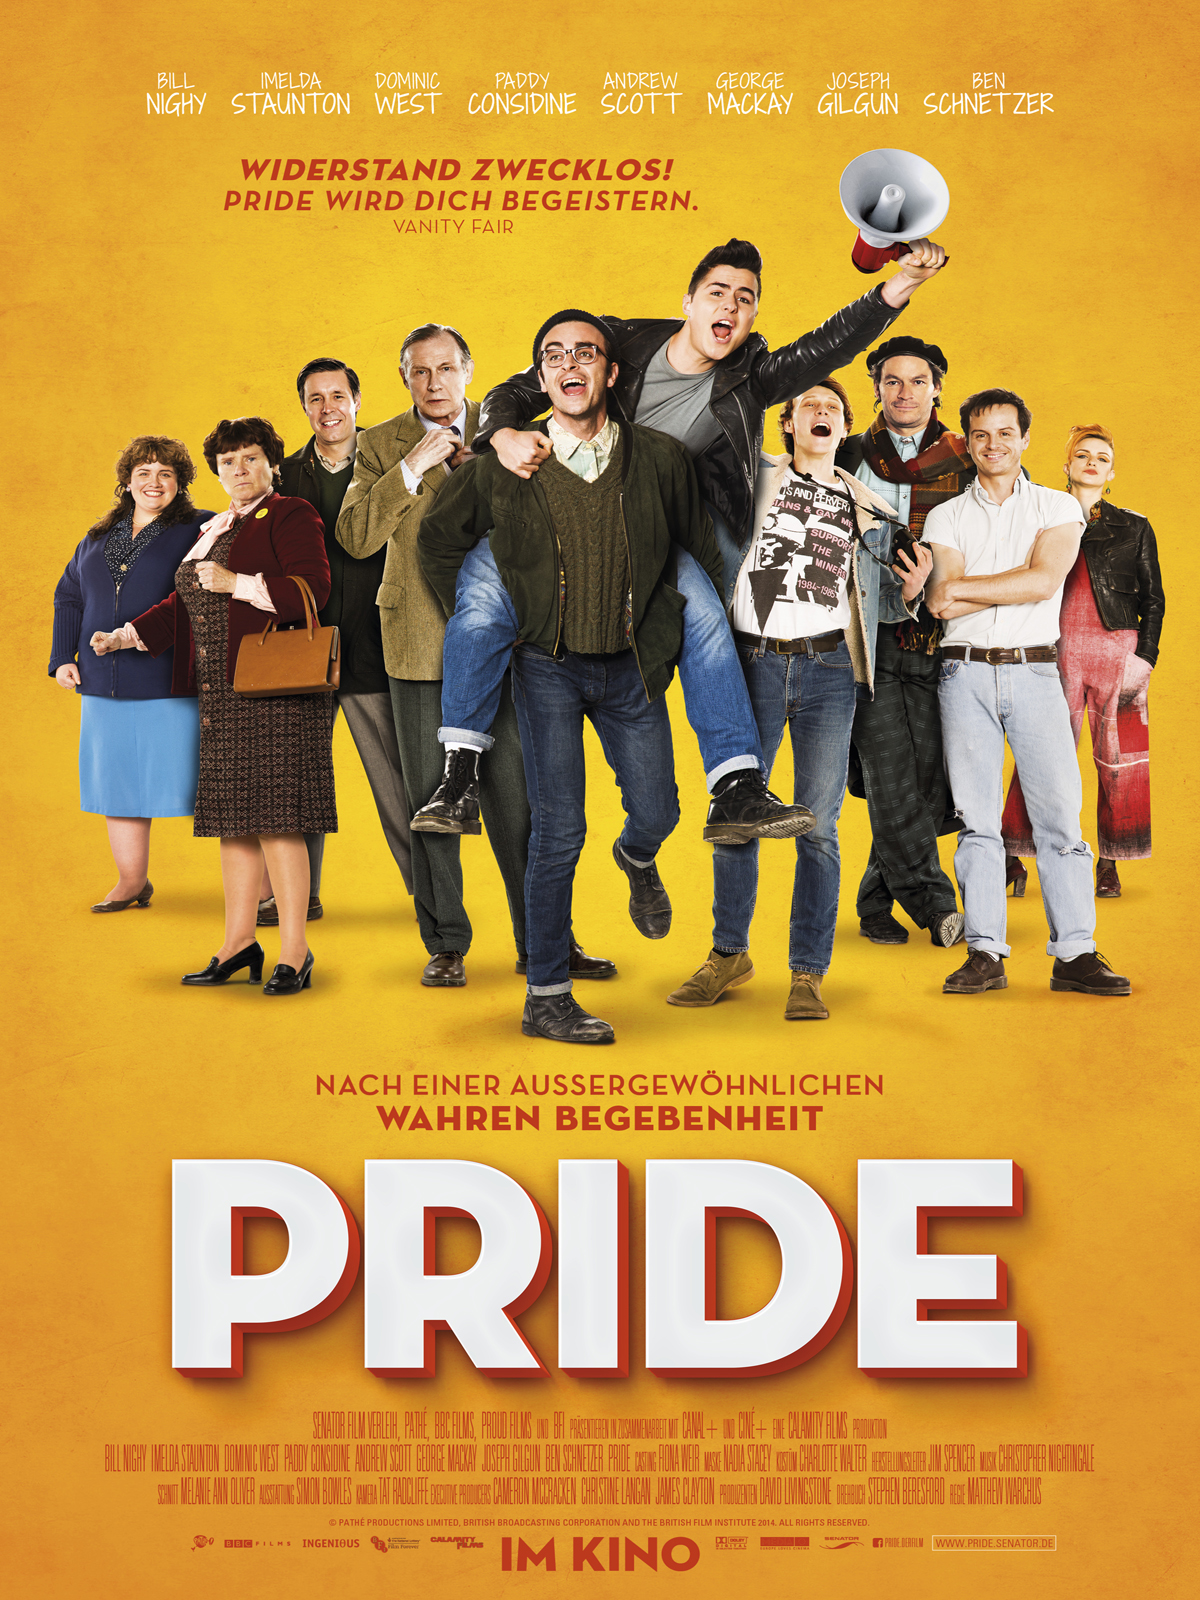 Pride - Film 2014 - FILMSTARTS.de